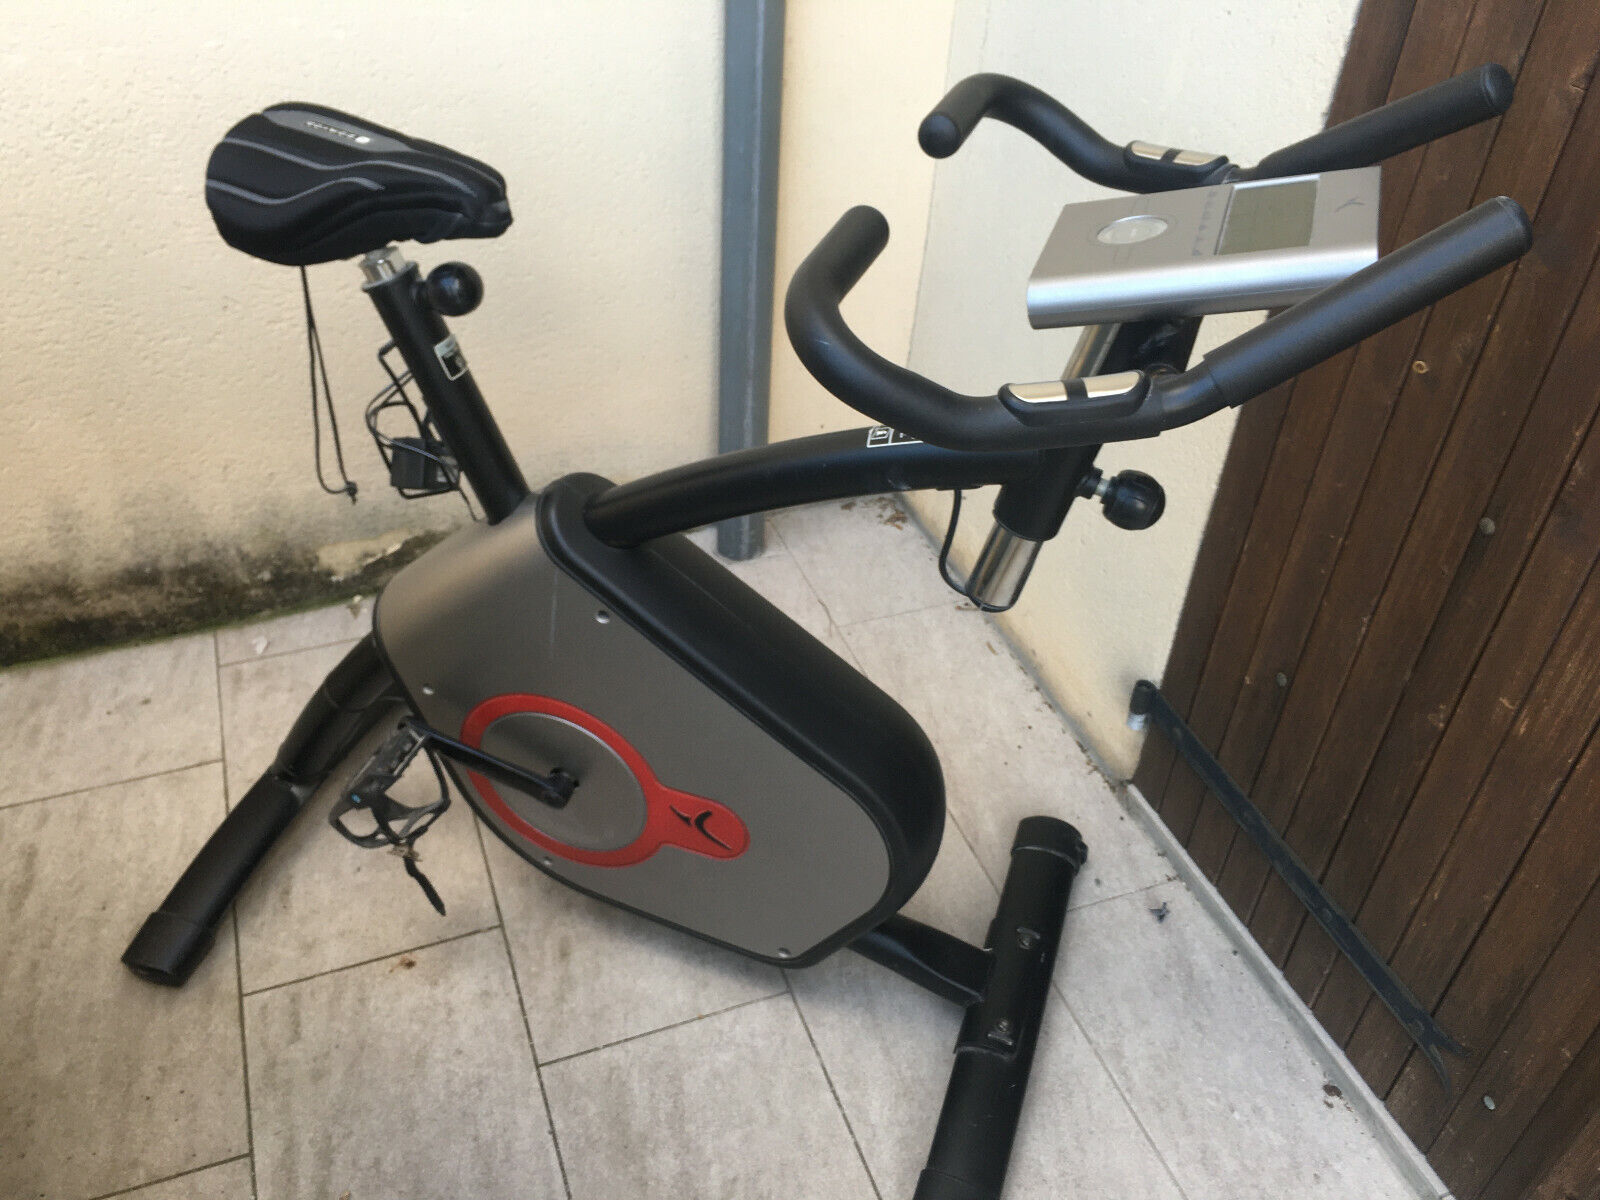 Vélo appartement domyos vm660, bon état, 6 programmes cardio training,